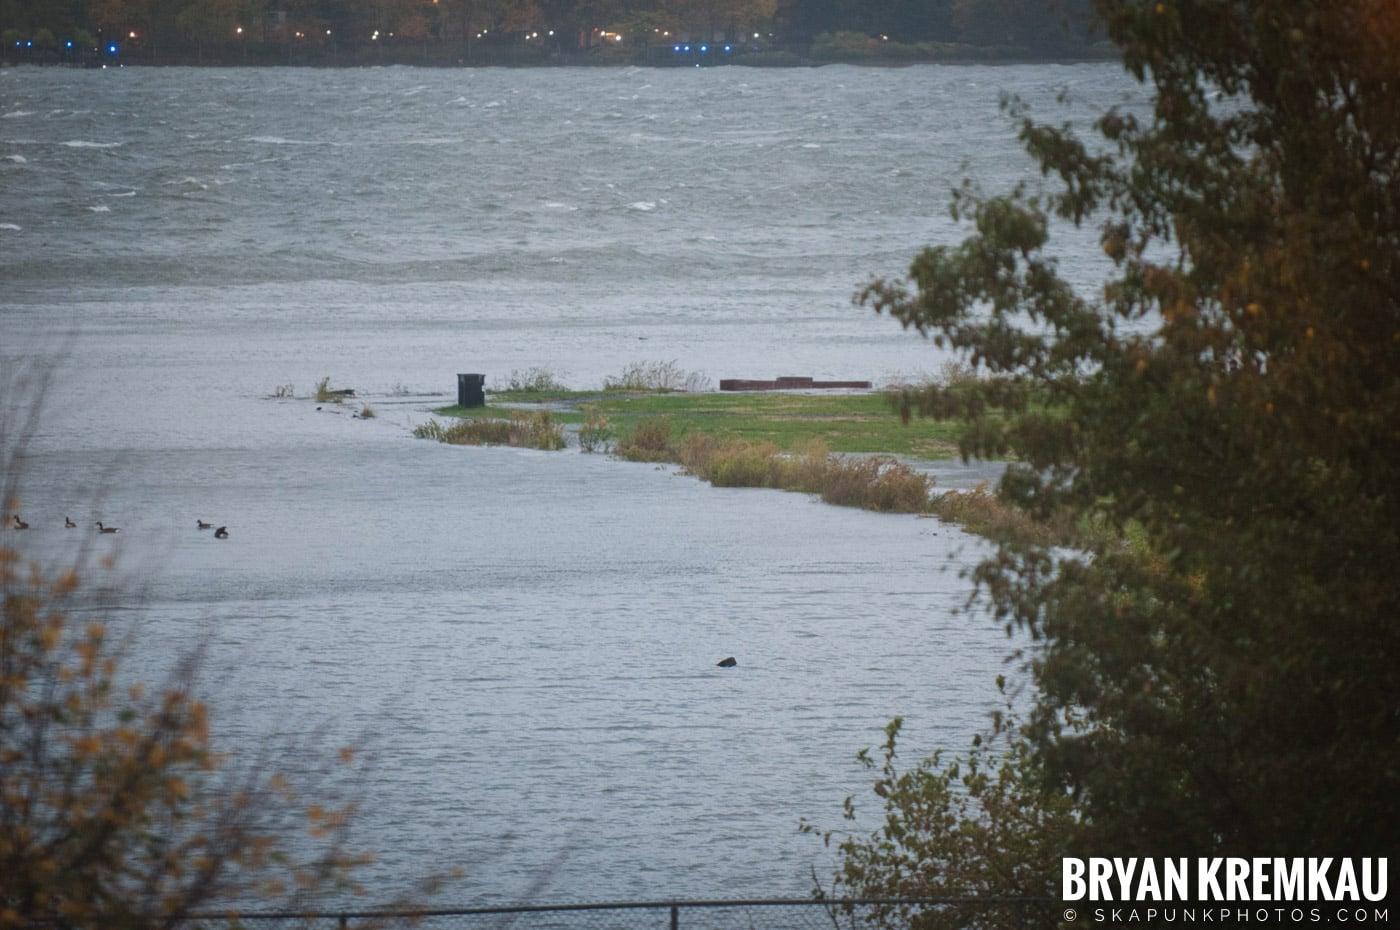 Hurricane Sandy 2012 @ Paulus Hook, Jersey City - 10.29.12 - 10.30.12 (57)